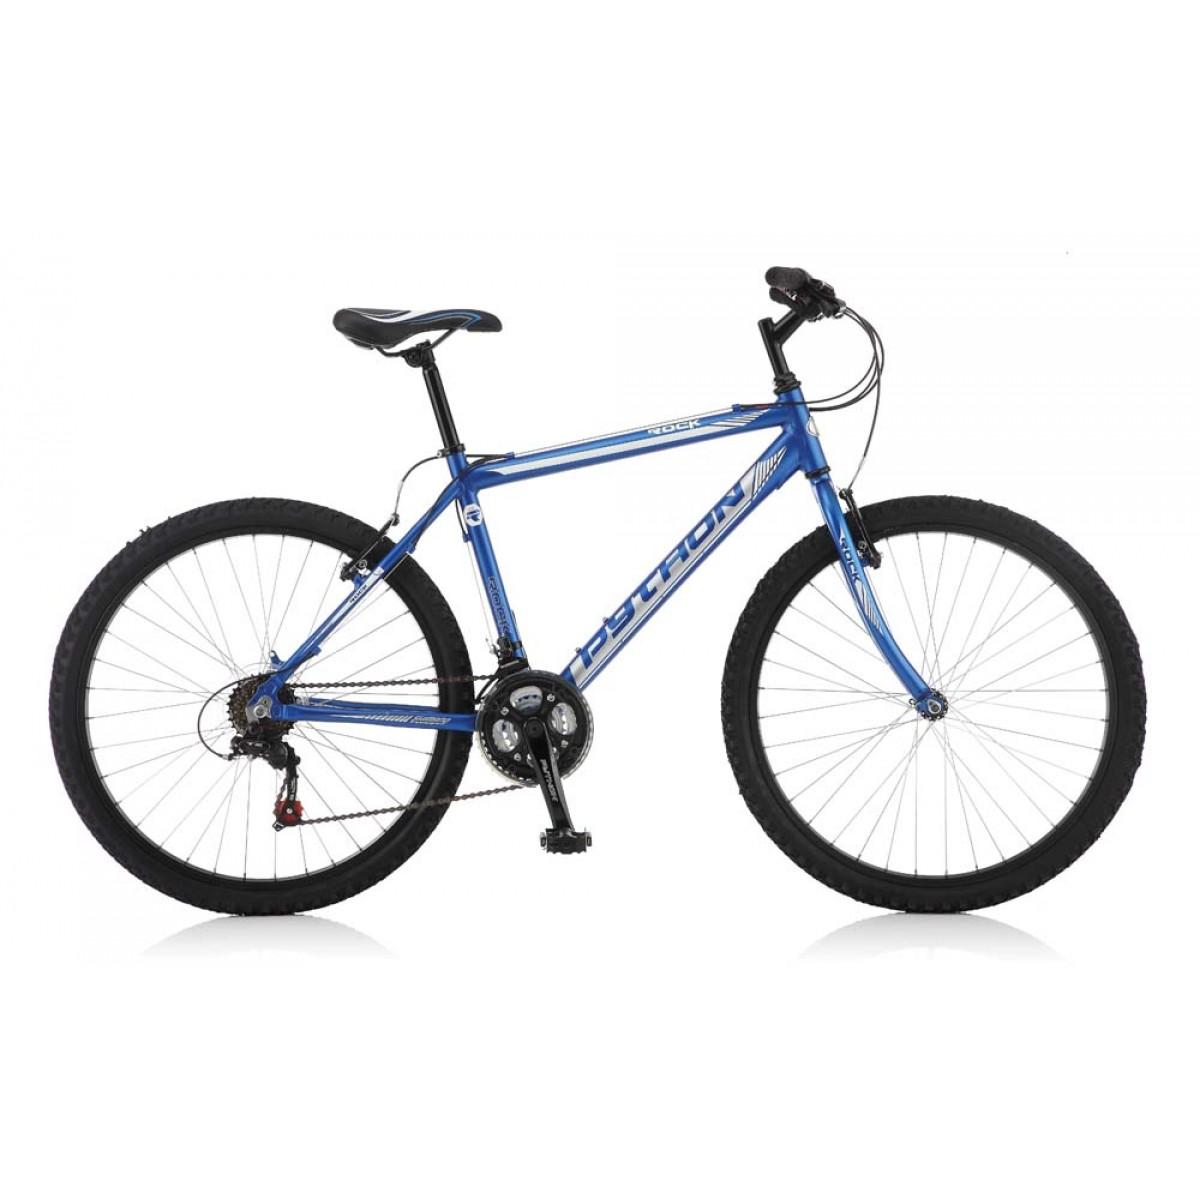 Python Rock 26 Gents Rigid Mountain Bike